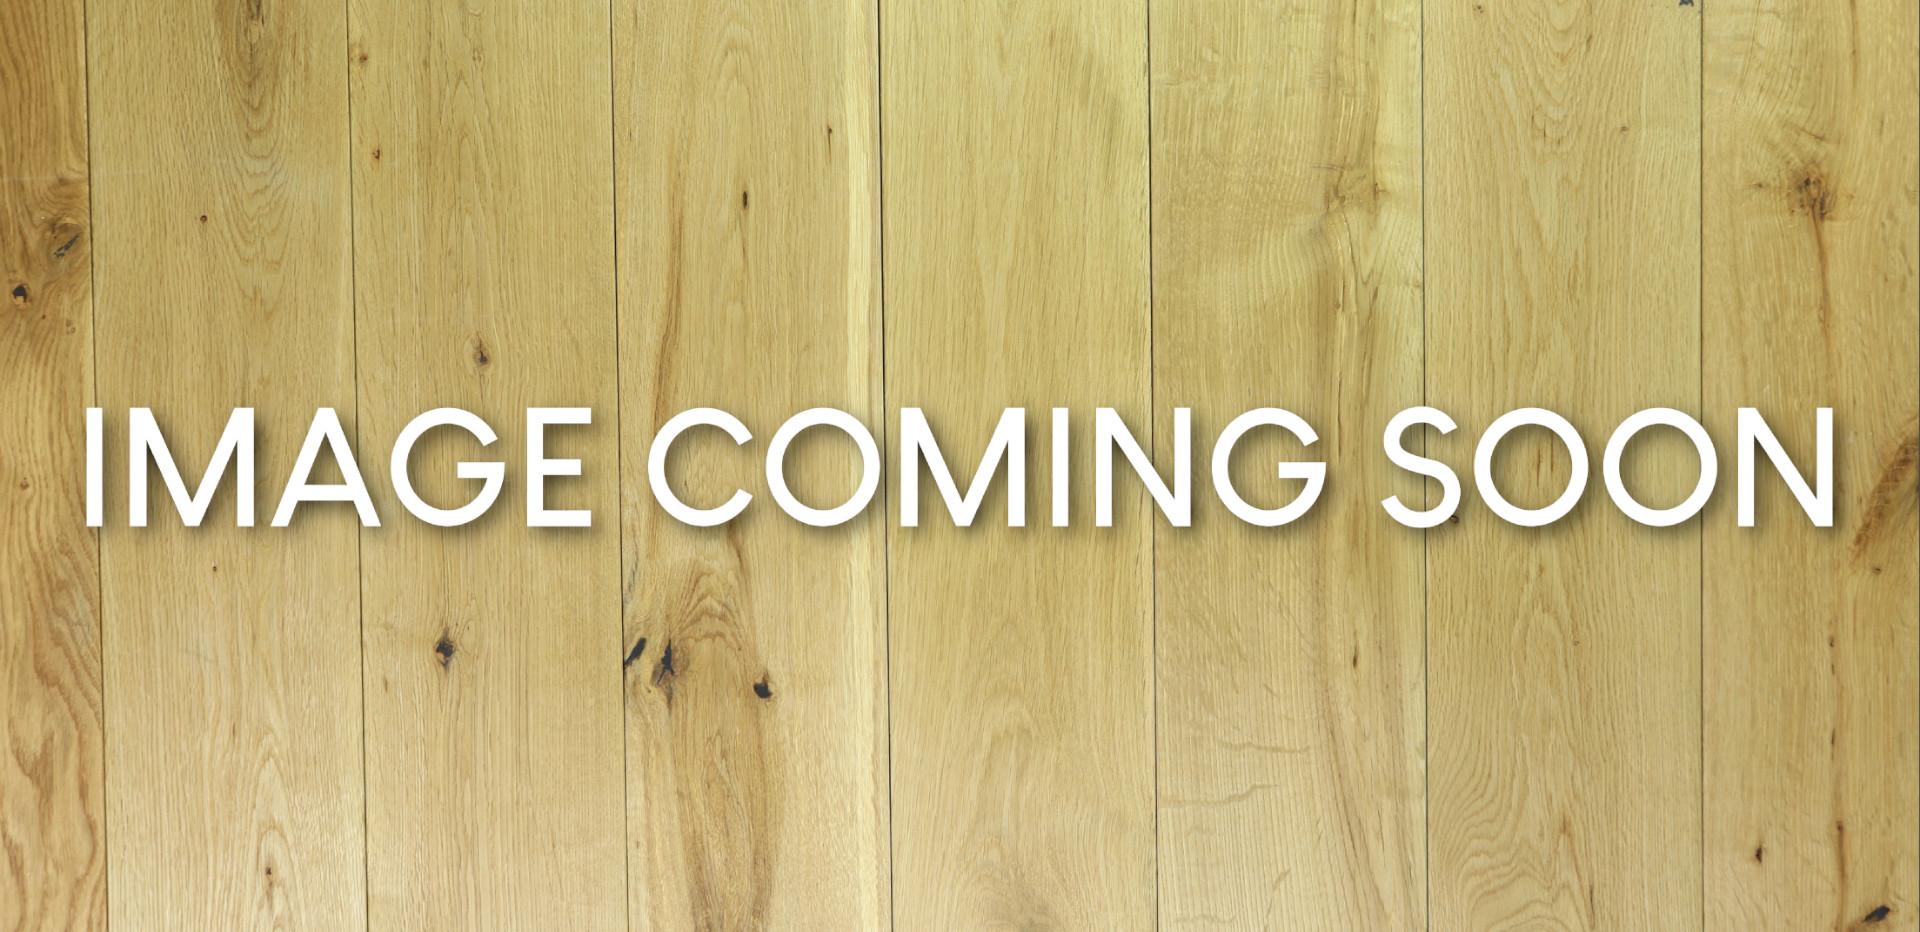 Fender Custom Shop Dale Wilson Masterbuilt 60 Strat Closet Classic Aged Olympic White 2019 Namm Show Guitar ~ Secondhand